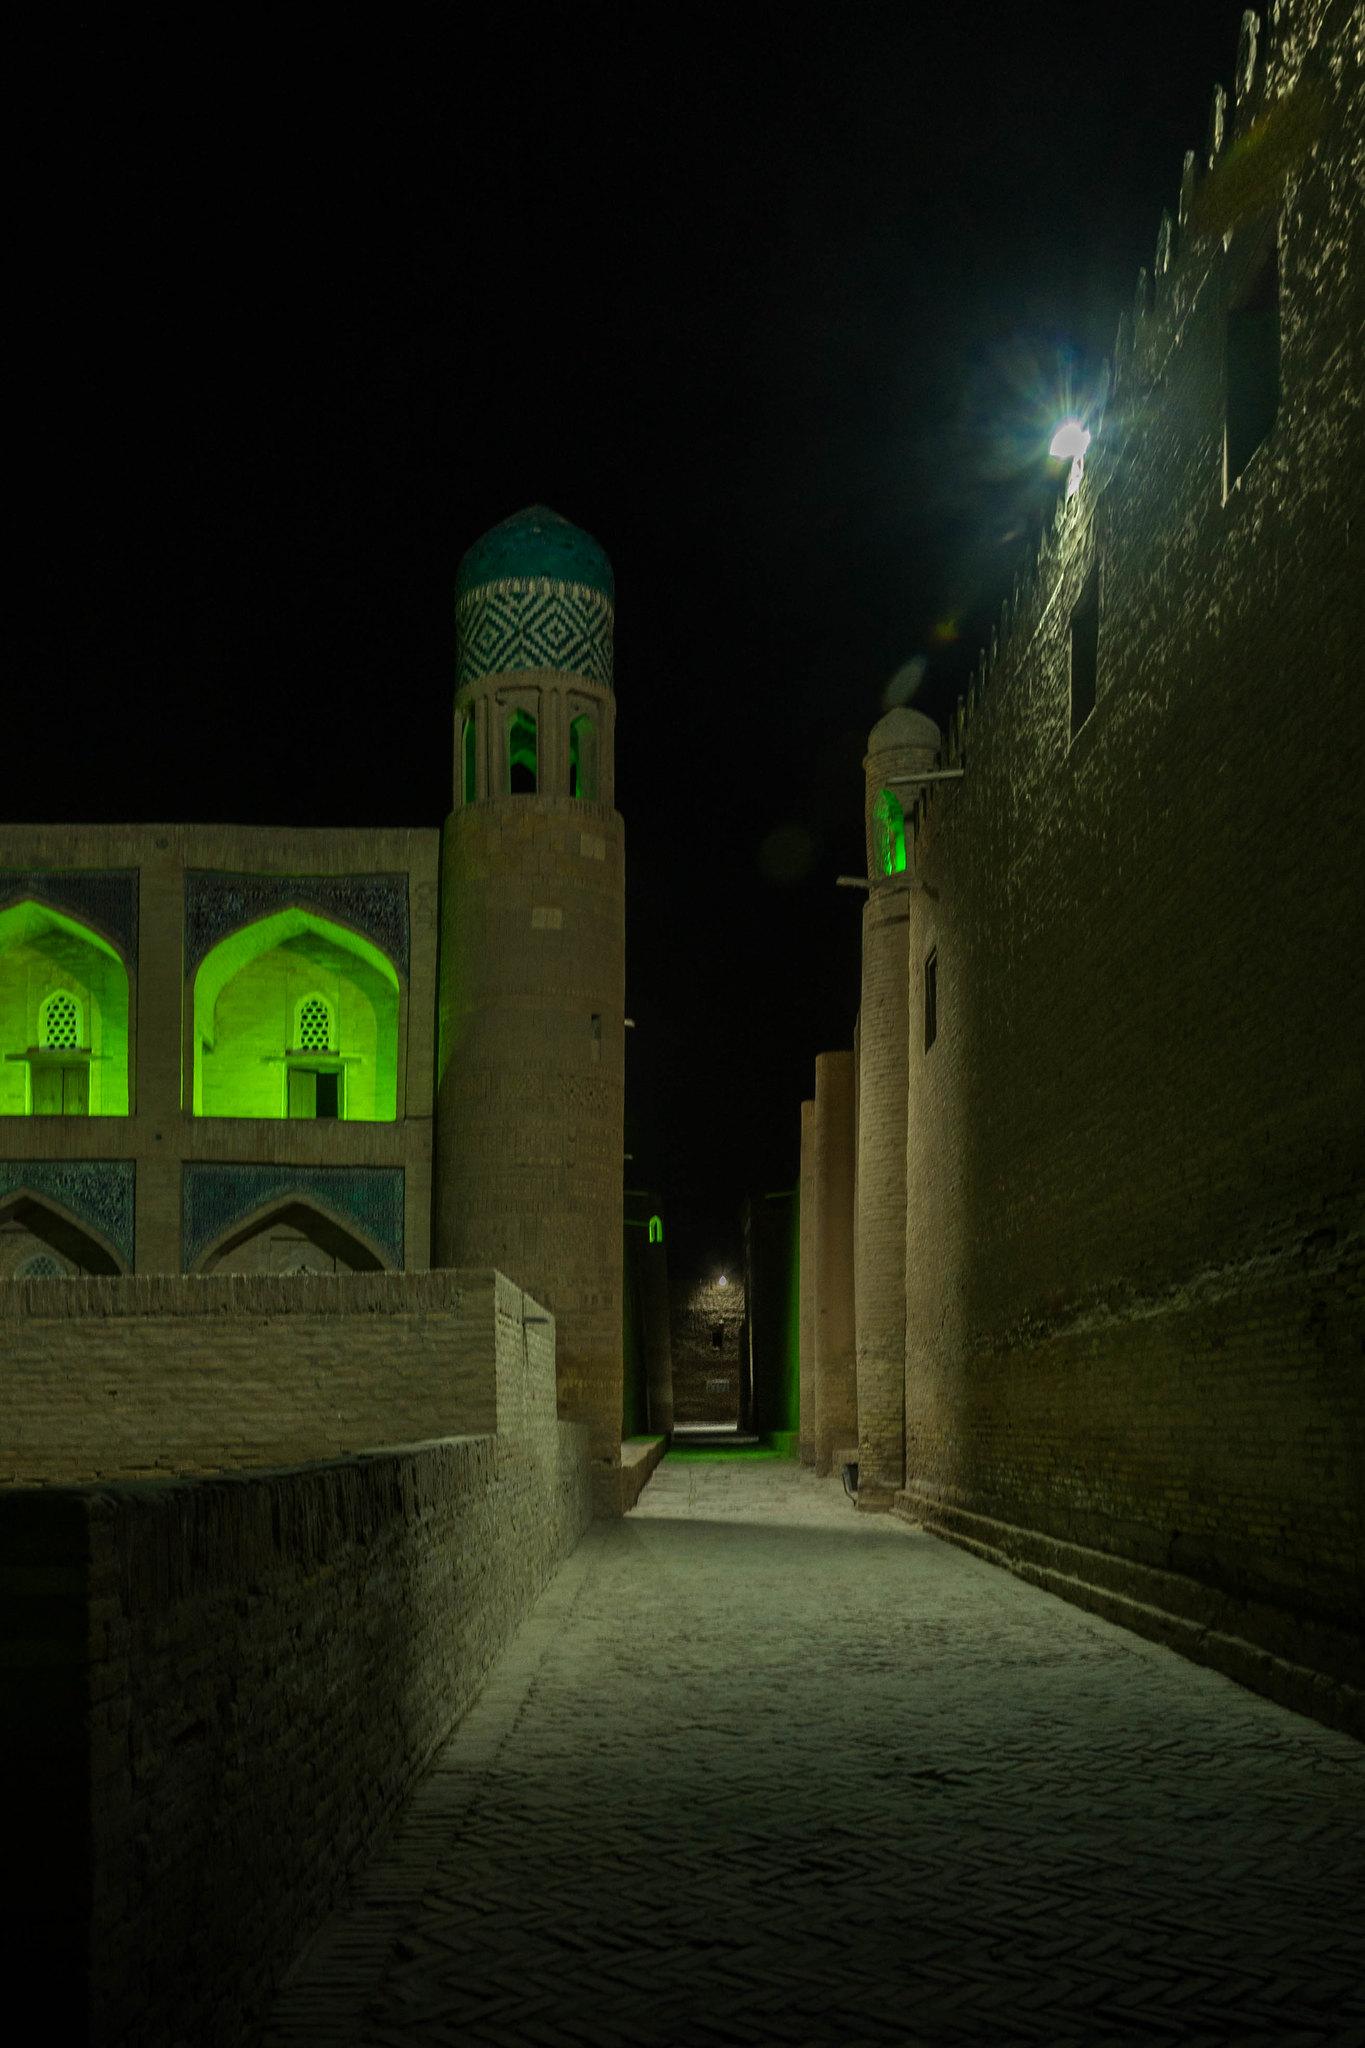 Khiva en Urbana y Arquitectura44665777715_3e98a48d92_k